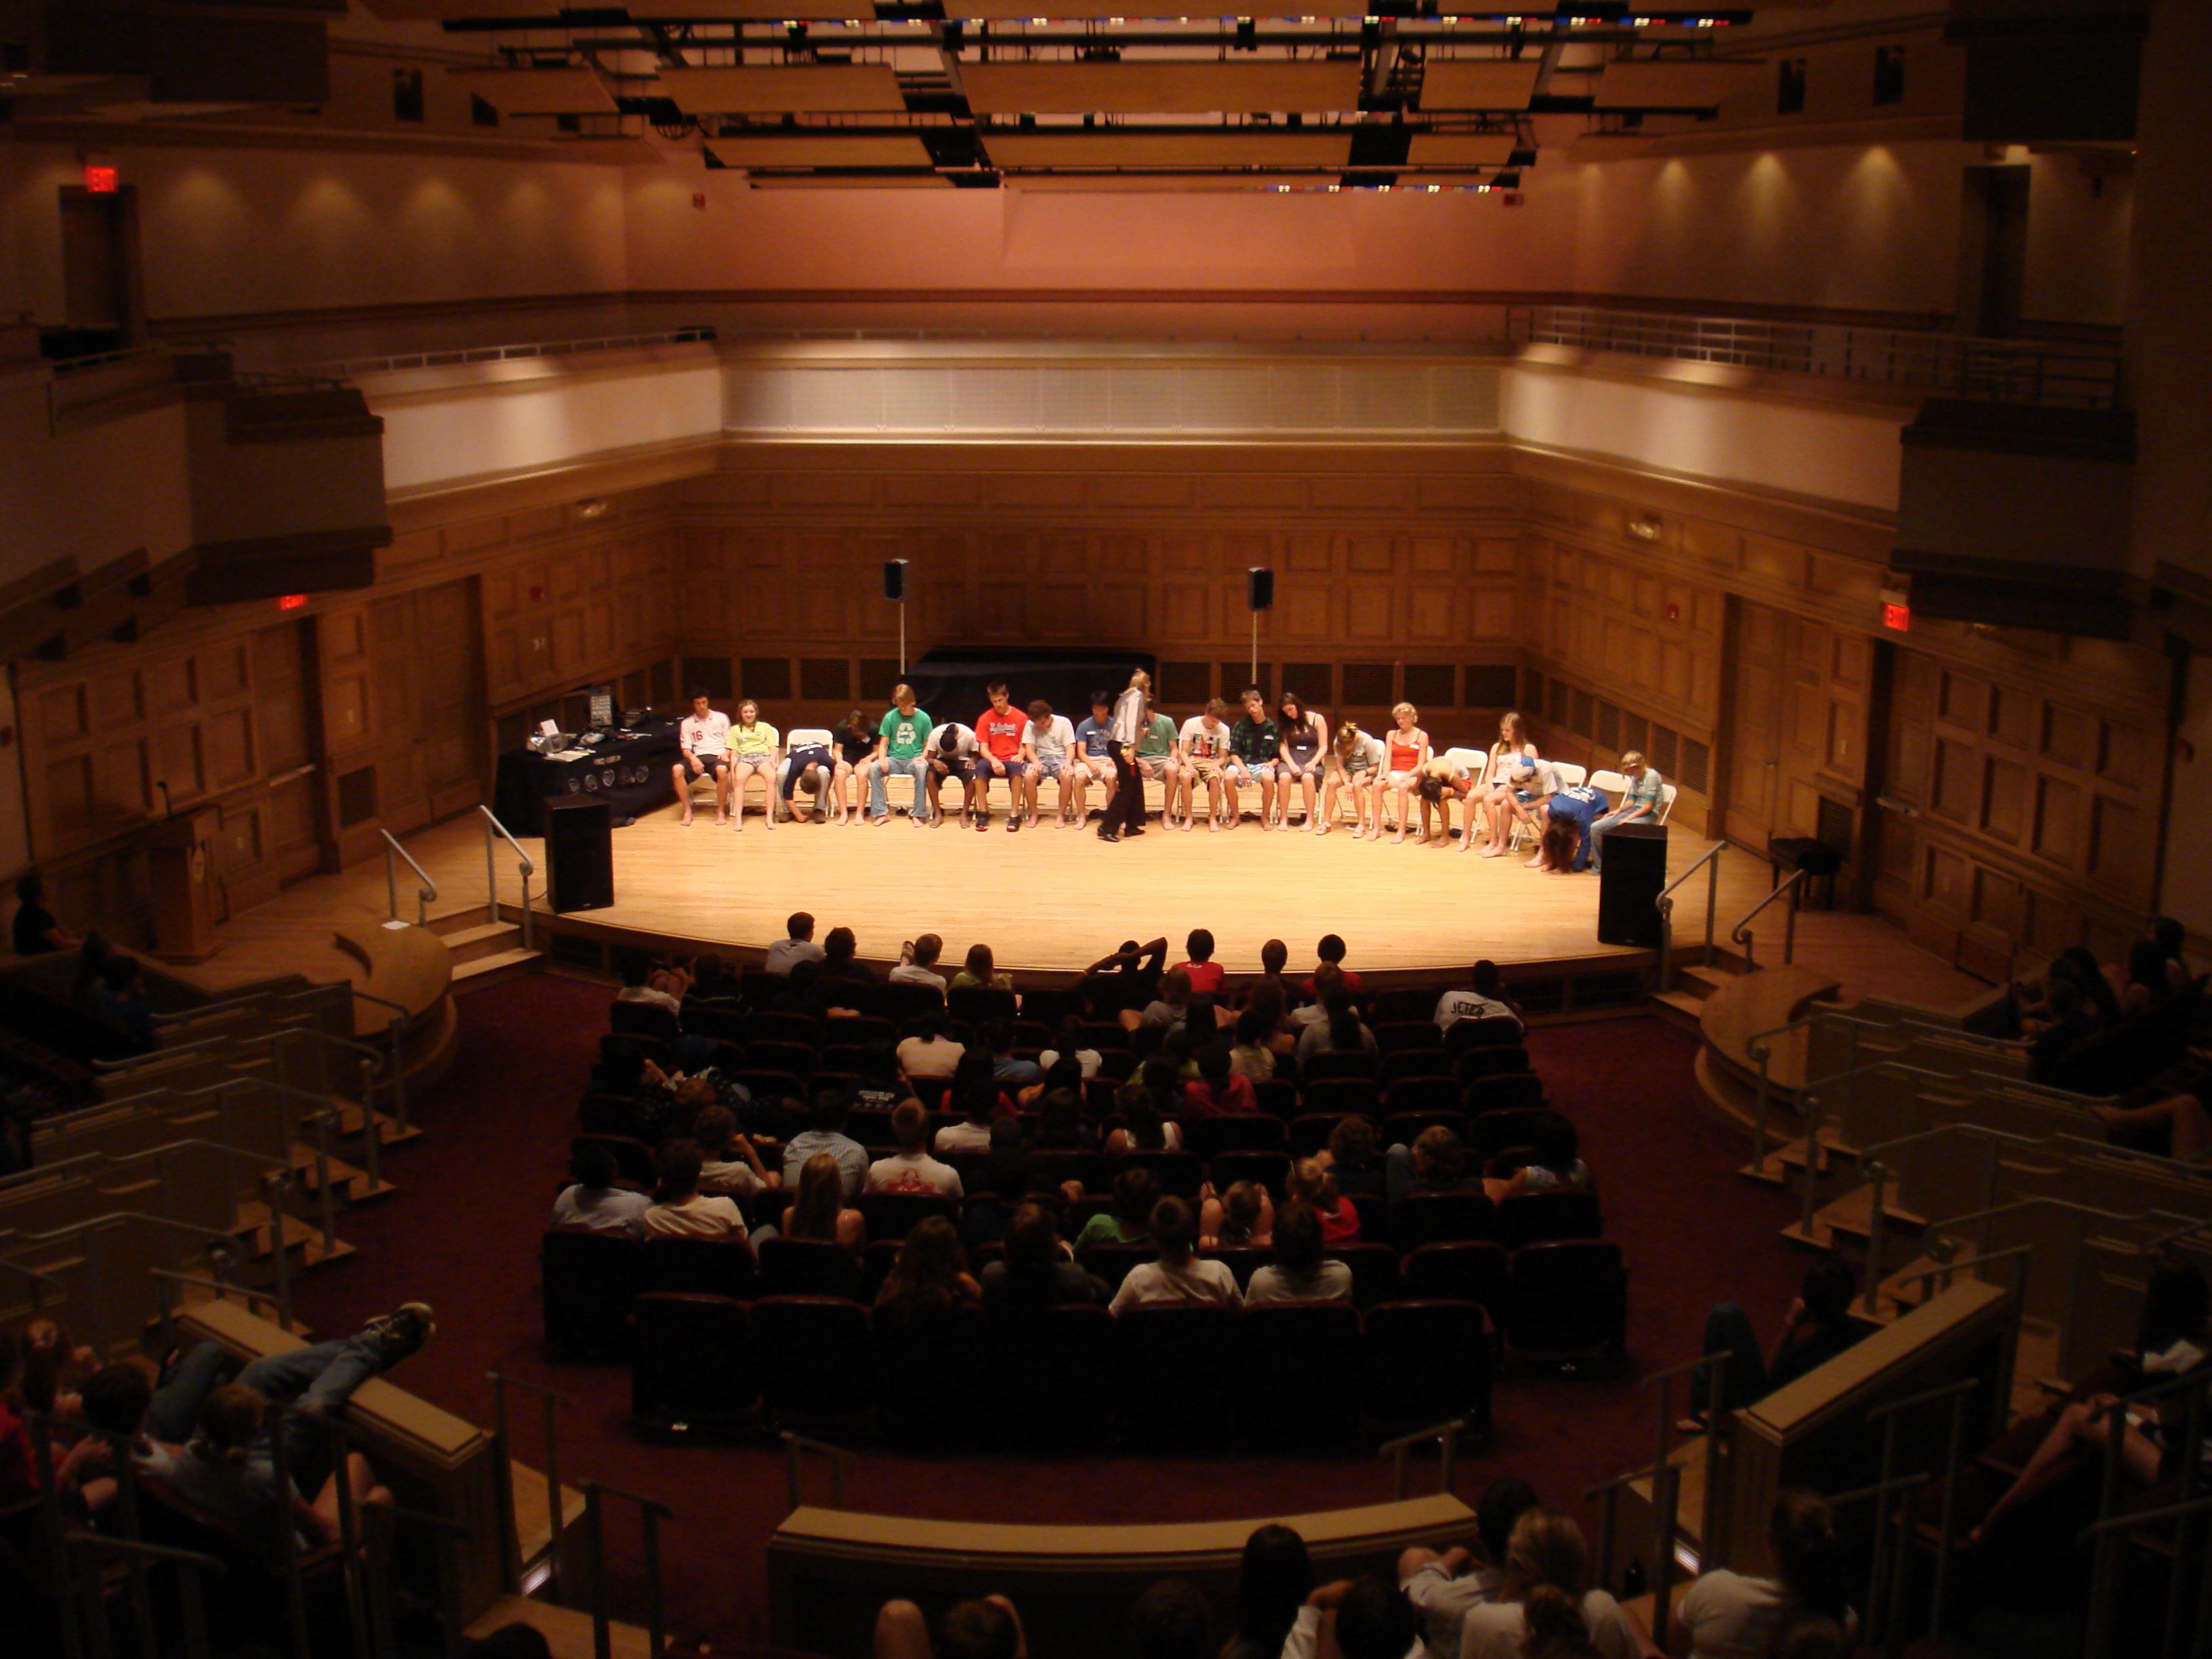 Hypnosis Stage Show Amoroso